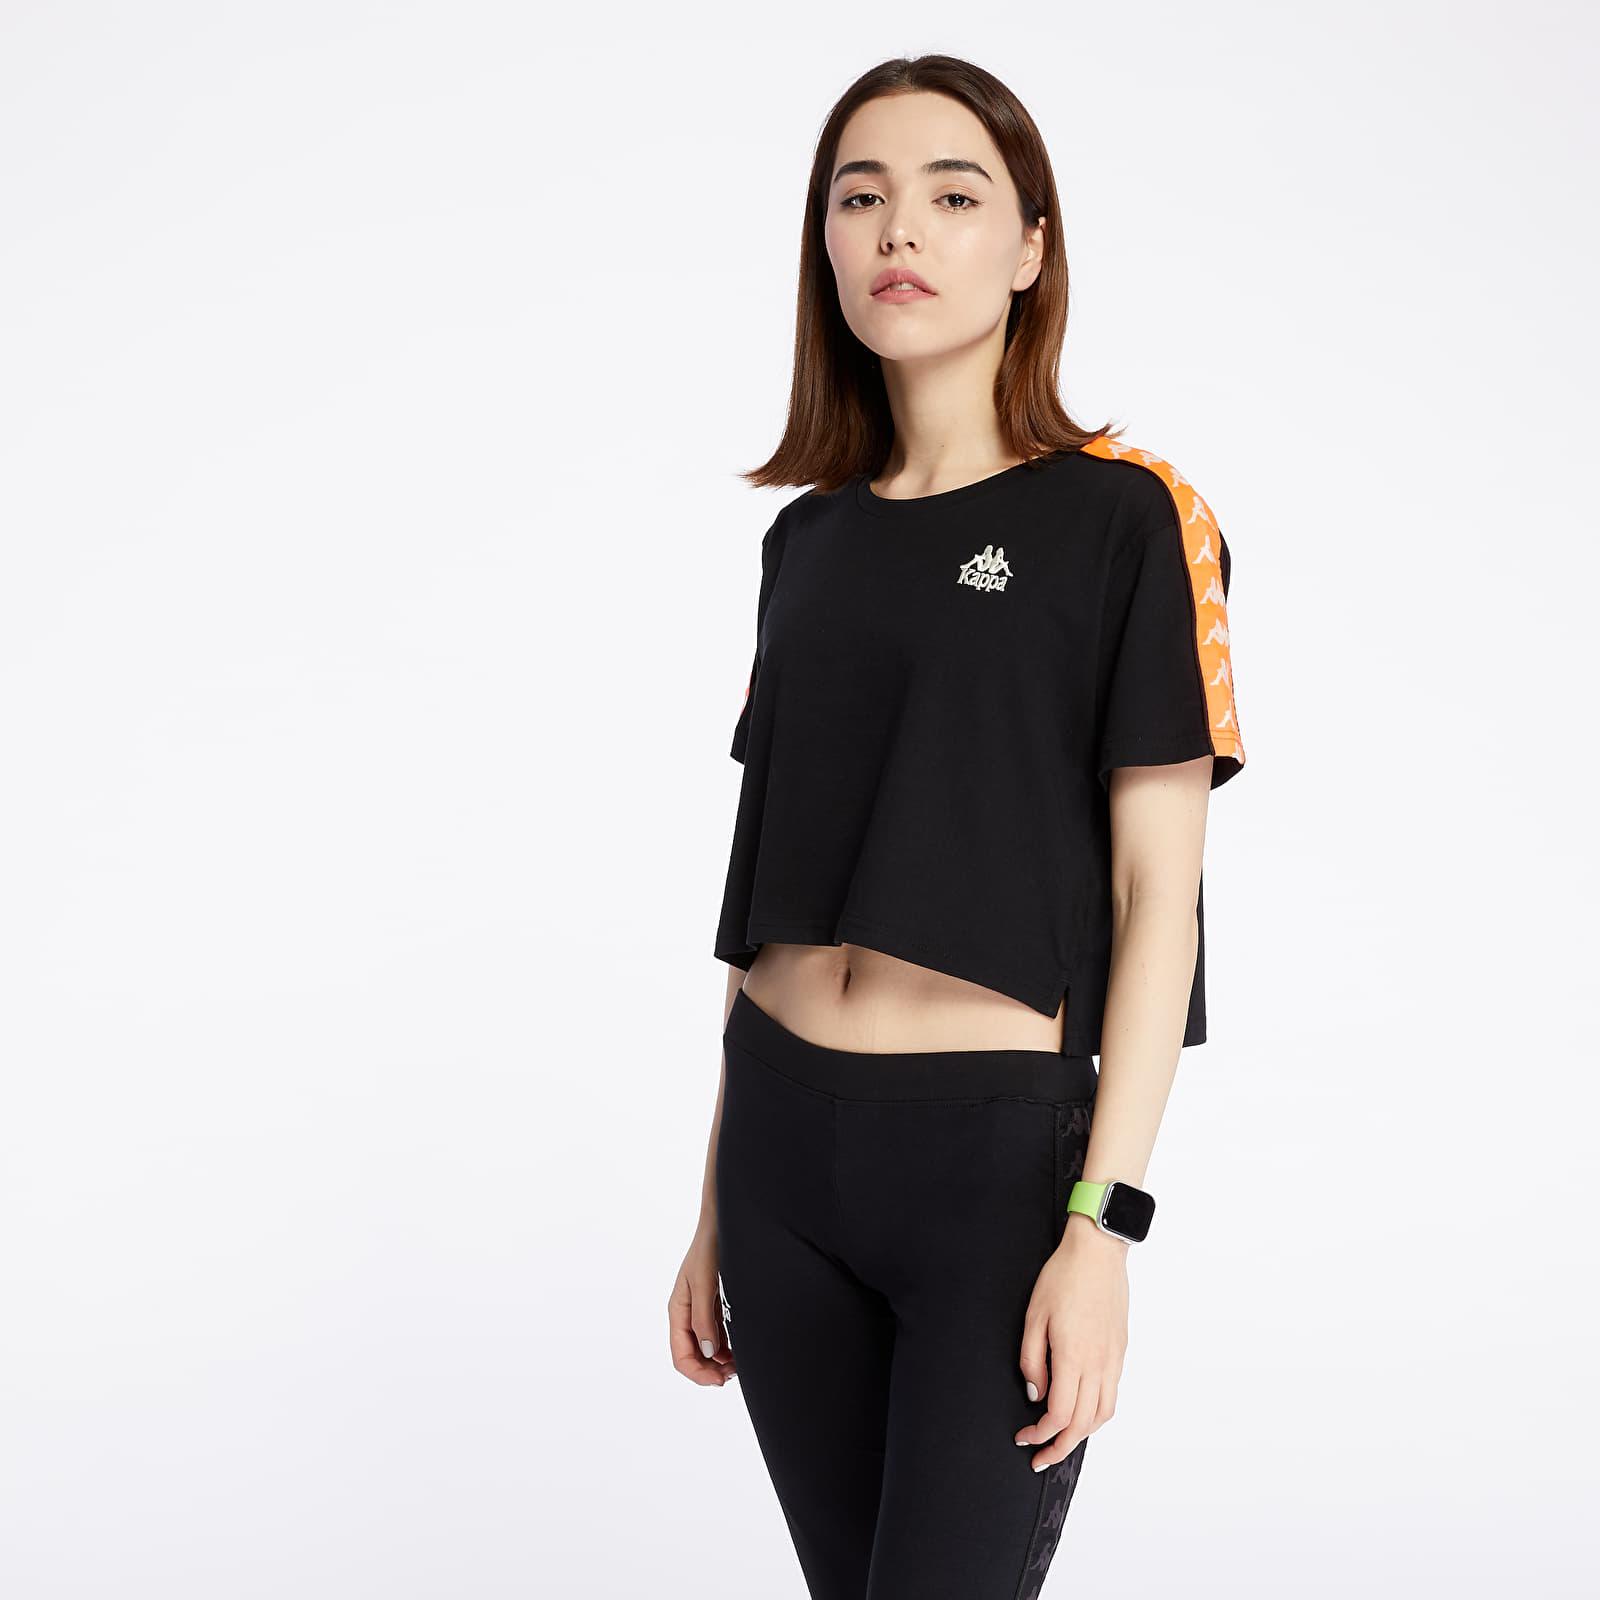 T-shirts Kappa 222 Banda Apua Tee Black/ Neon Orange